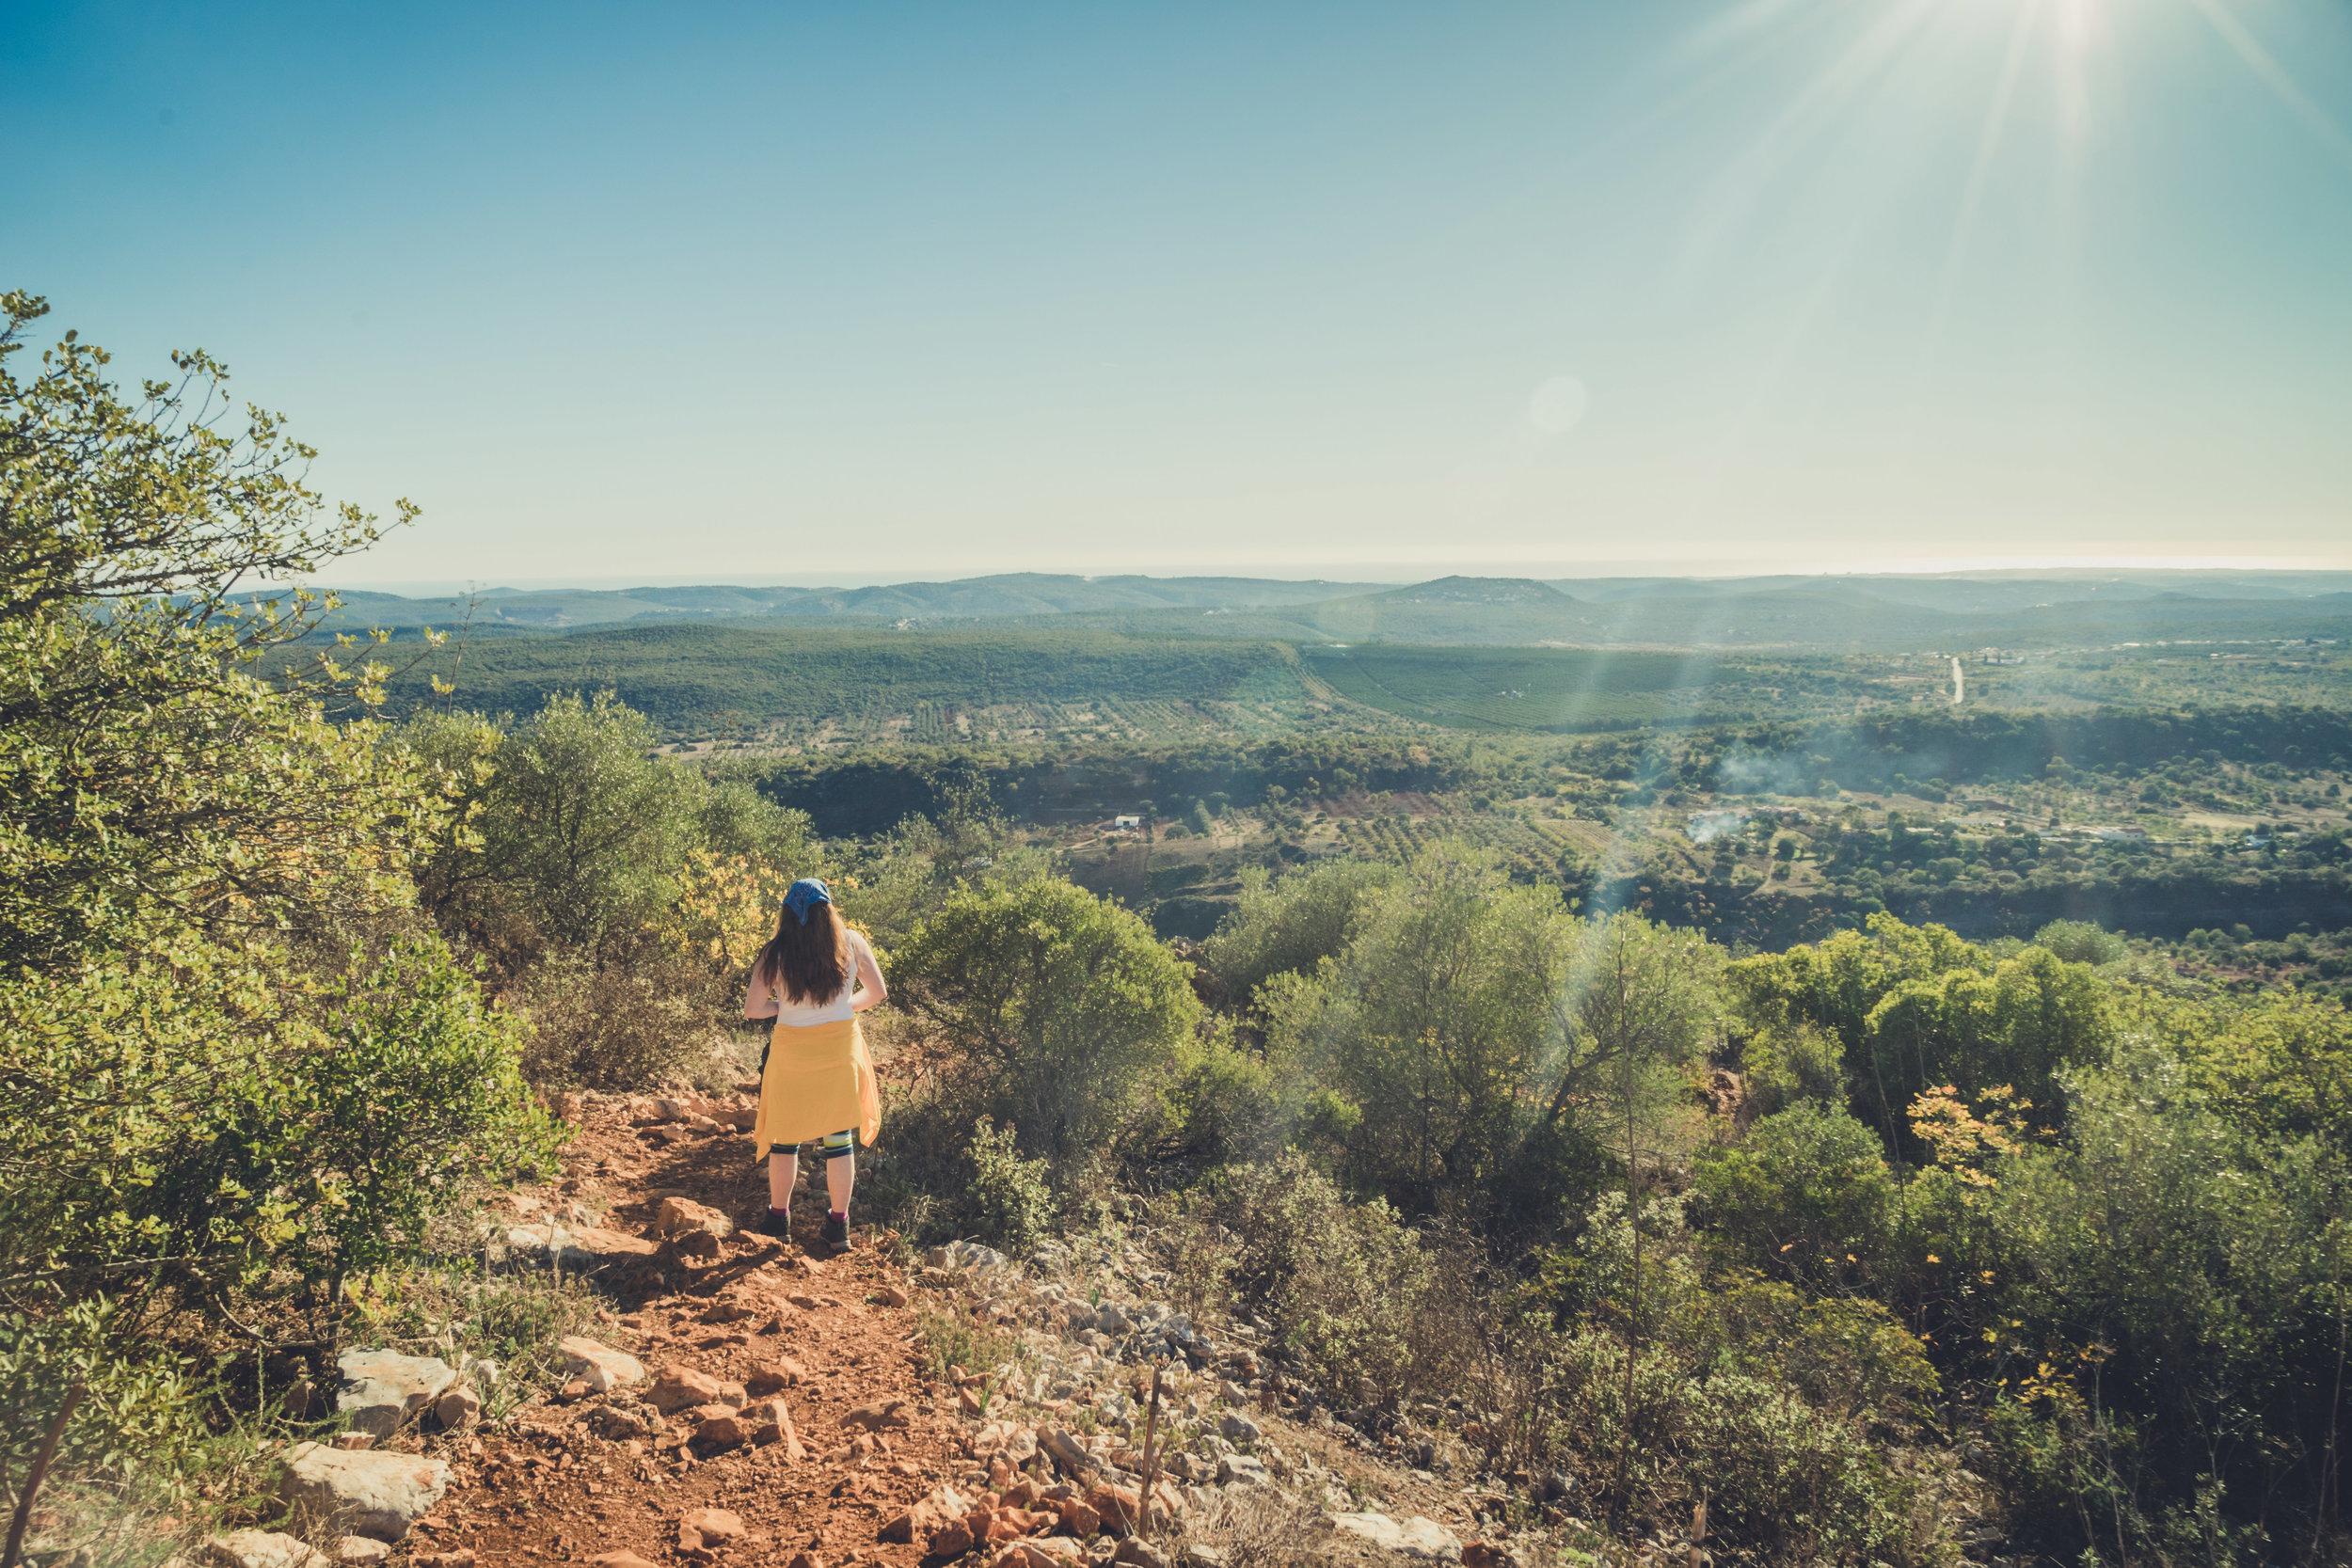 Hiking. algarve. portugal. talbe mountain. walking in the mountains. Rocha da Pena.. tree, view. green. canyon..jpg